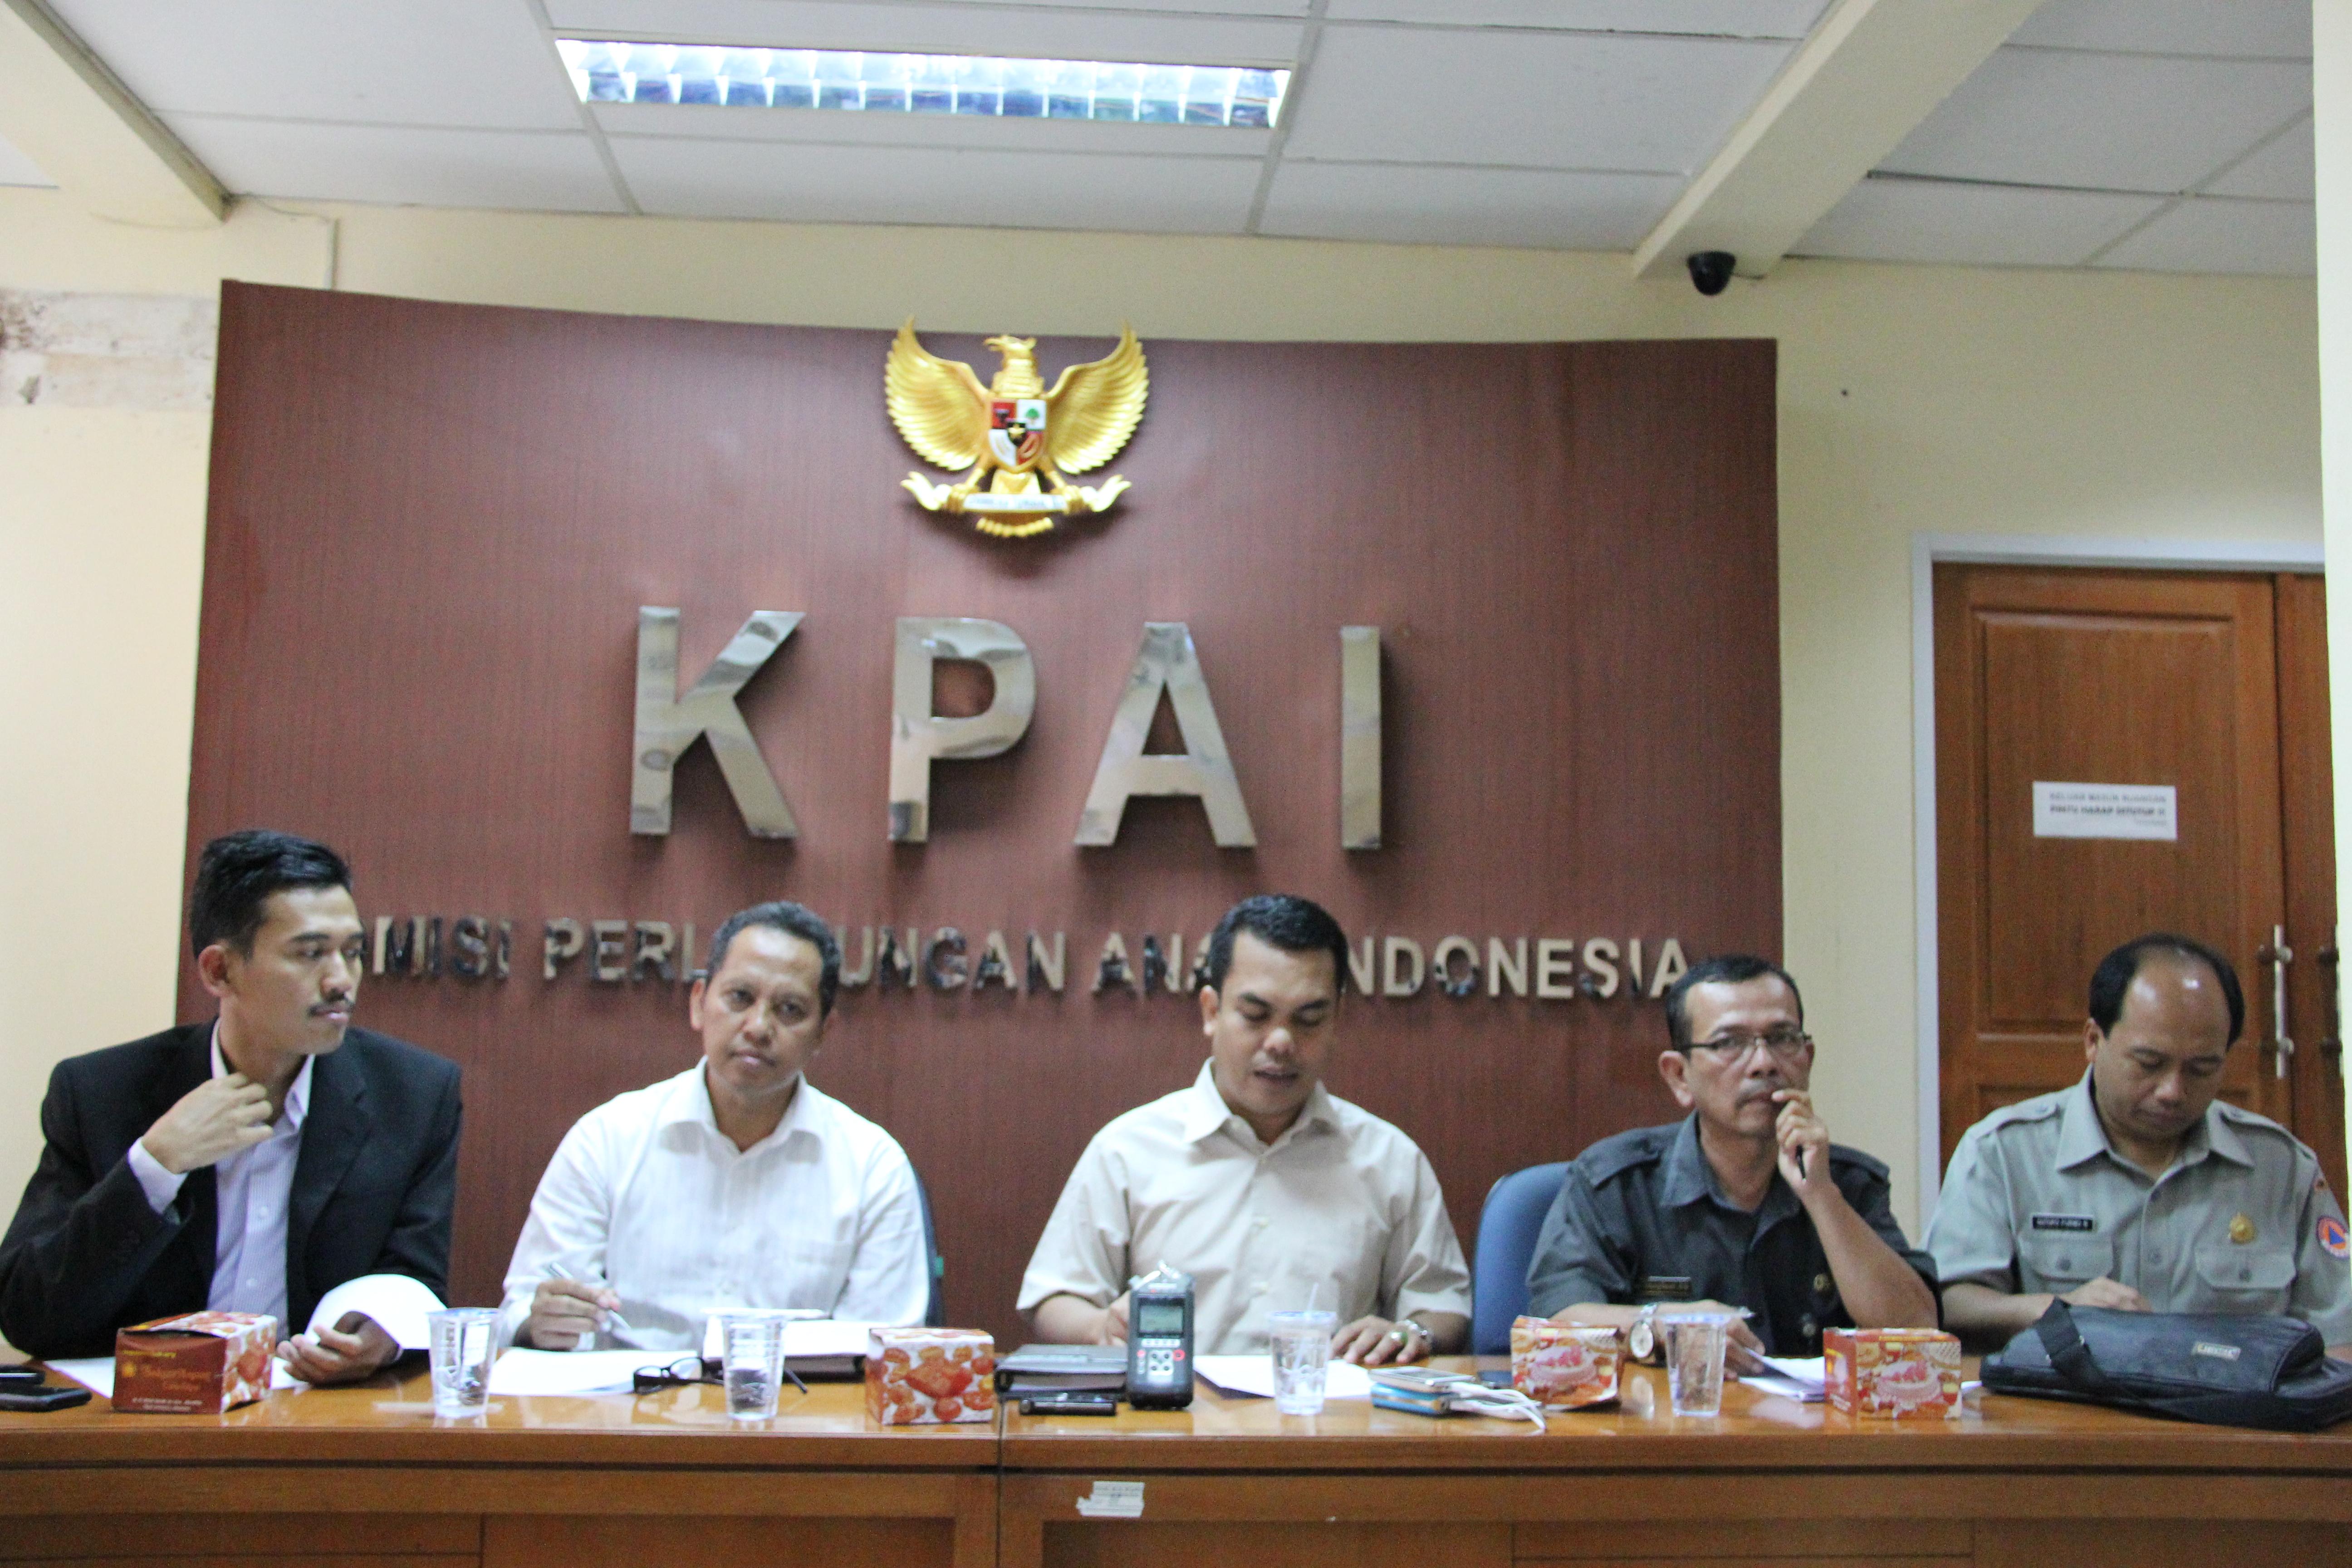 KPAI Komisi Perlindungan Anak Indonesia